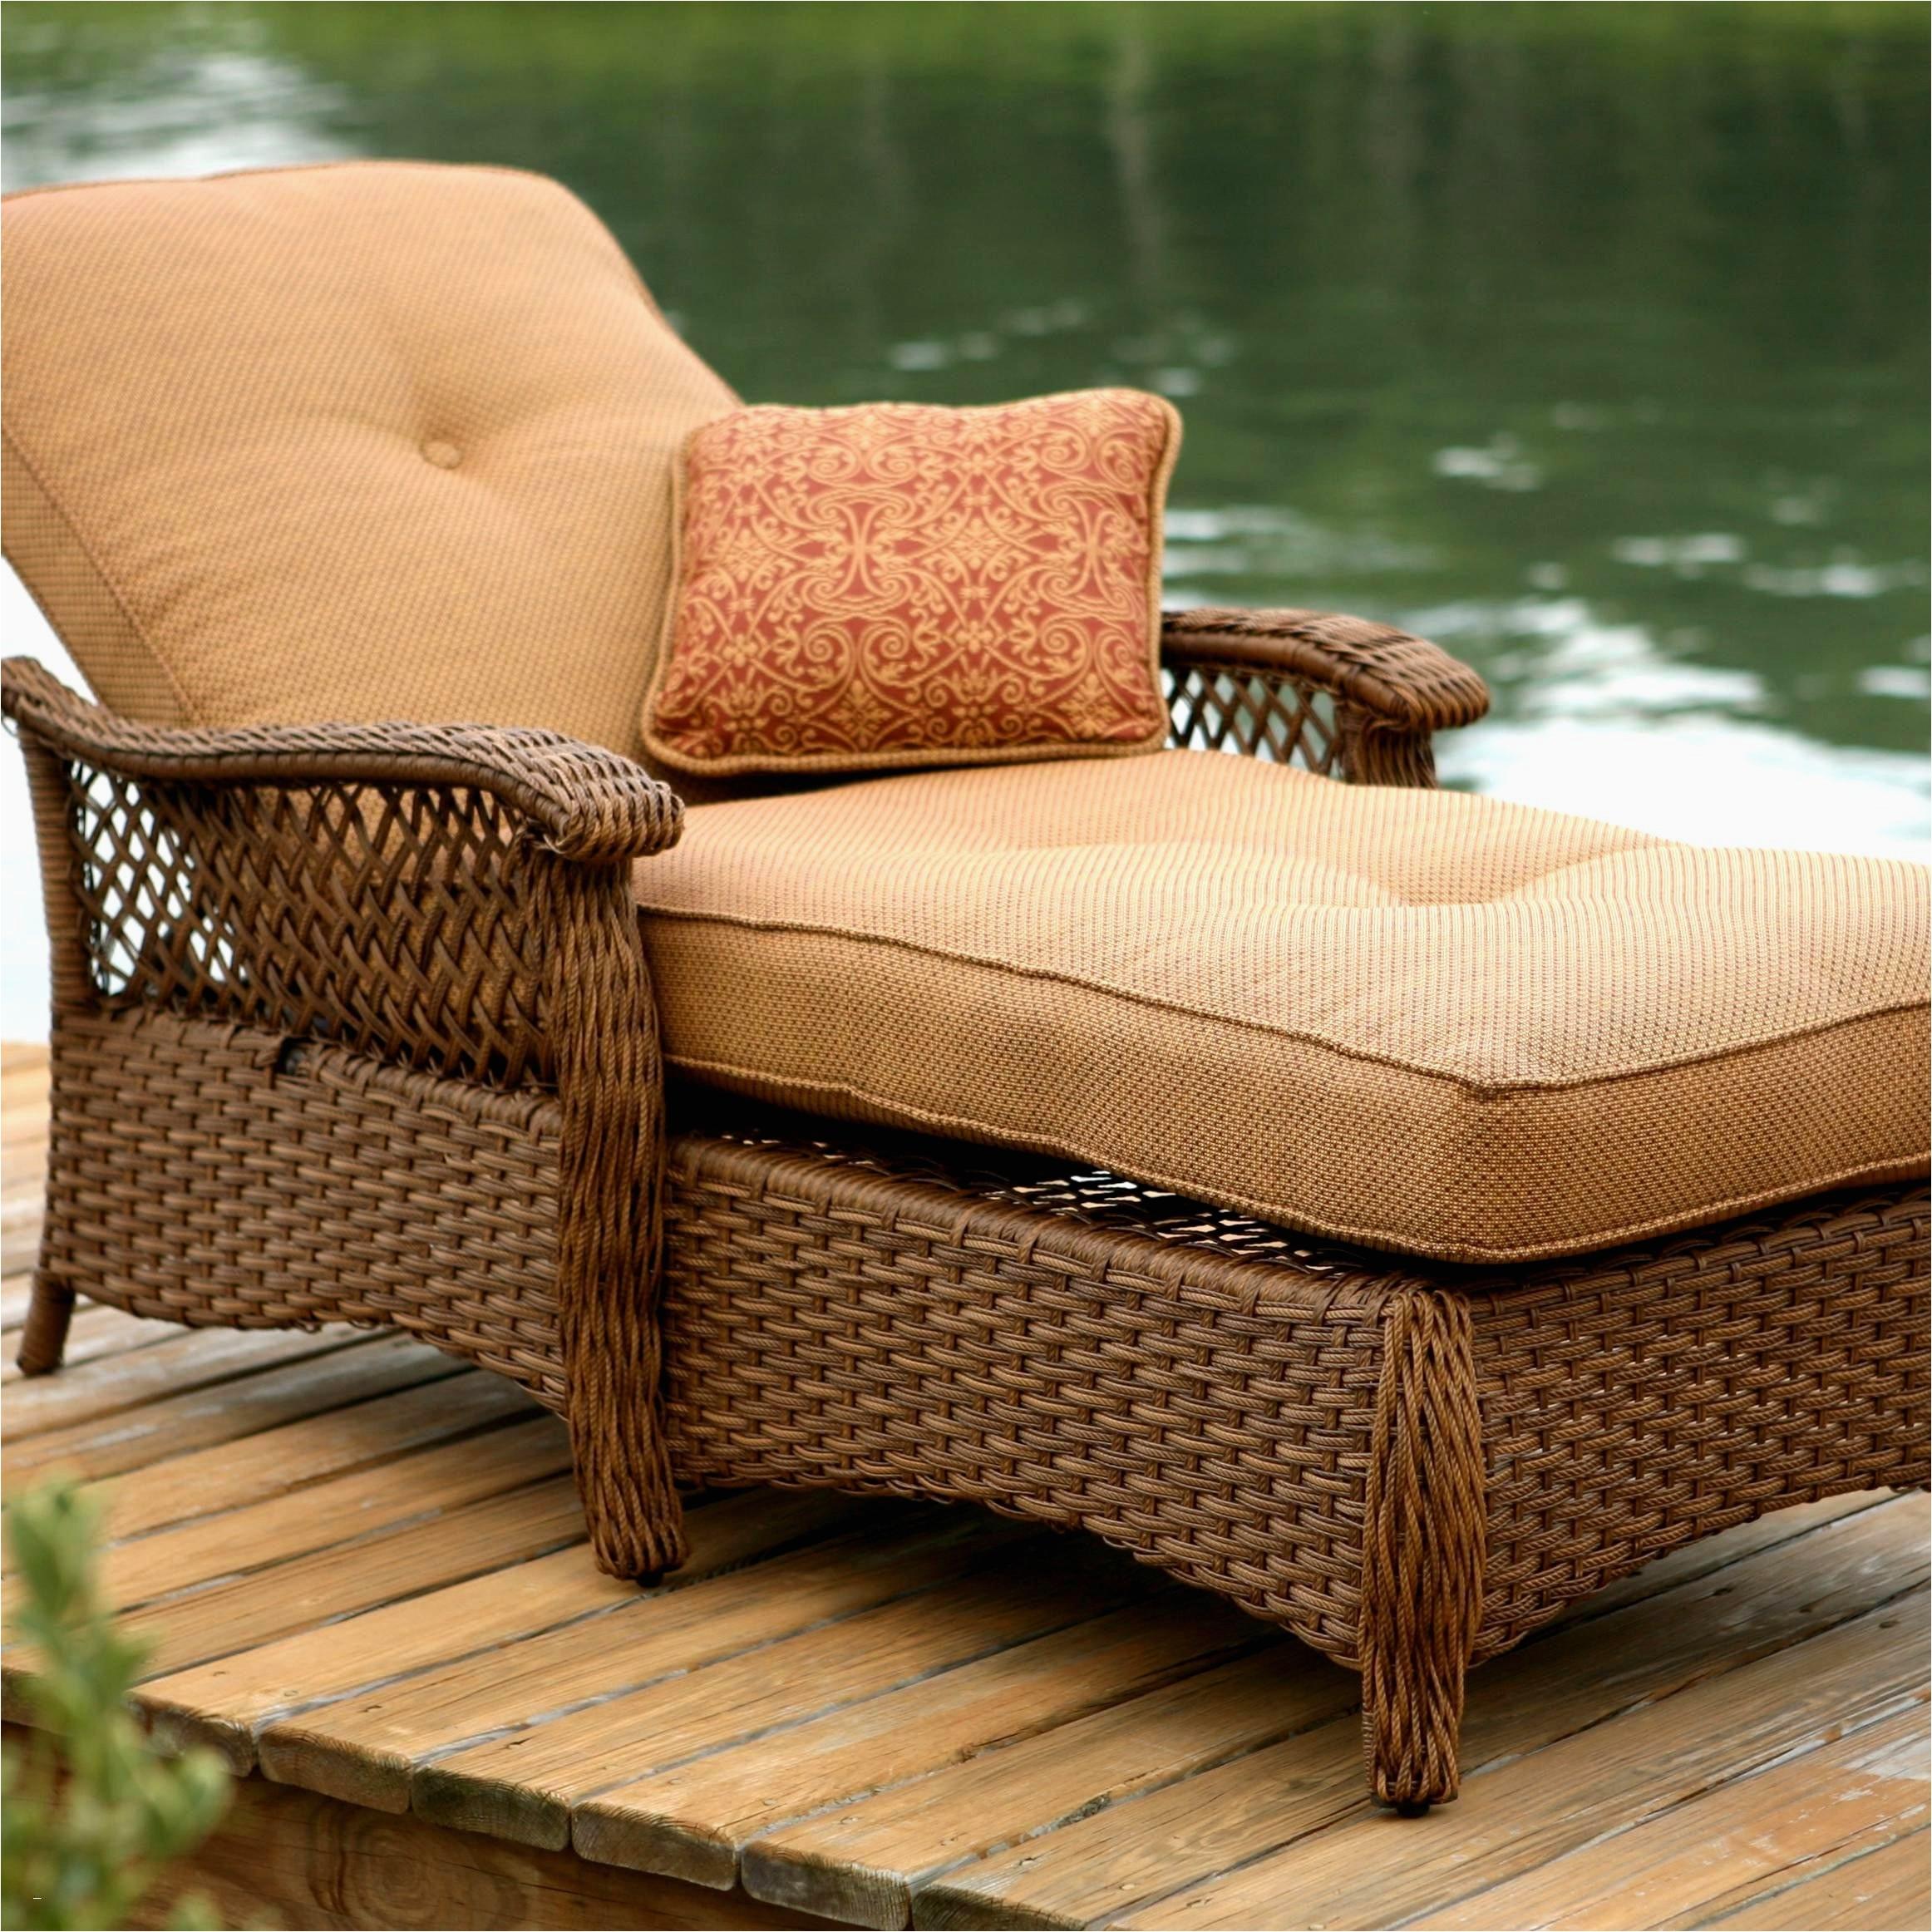 wicker patio furniture sale best of designer outdoor furniture luxury exciting wicker outdoor sofa 0d image